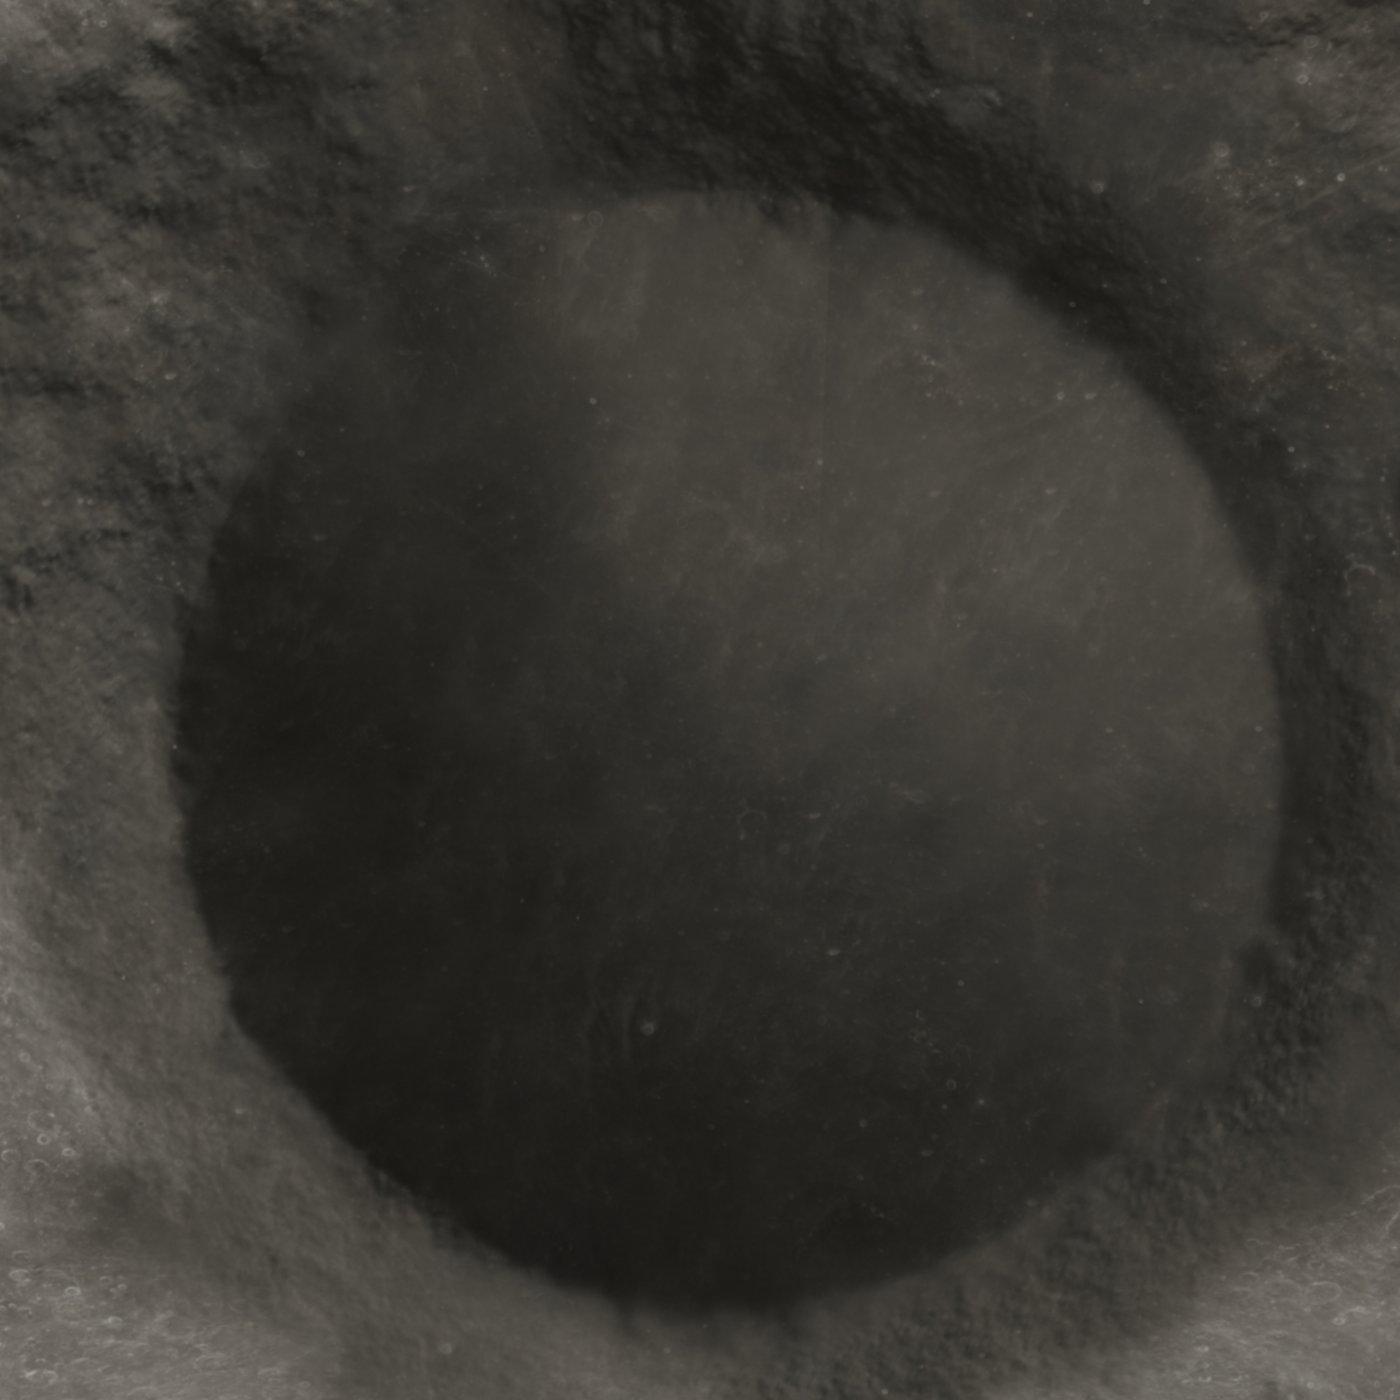 Lunar crater 3D